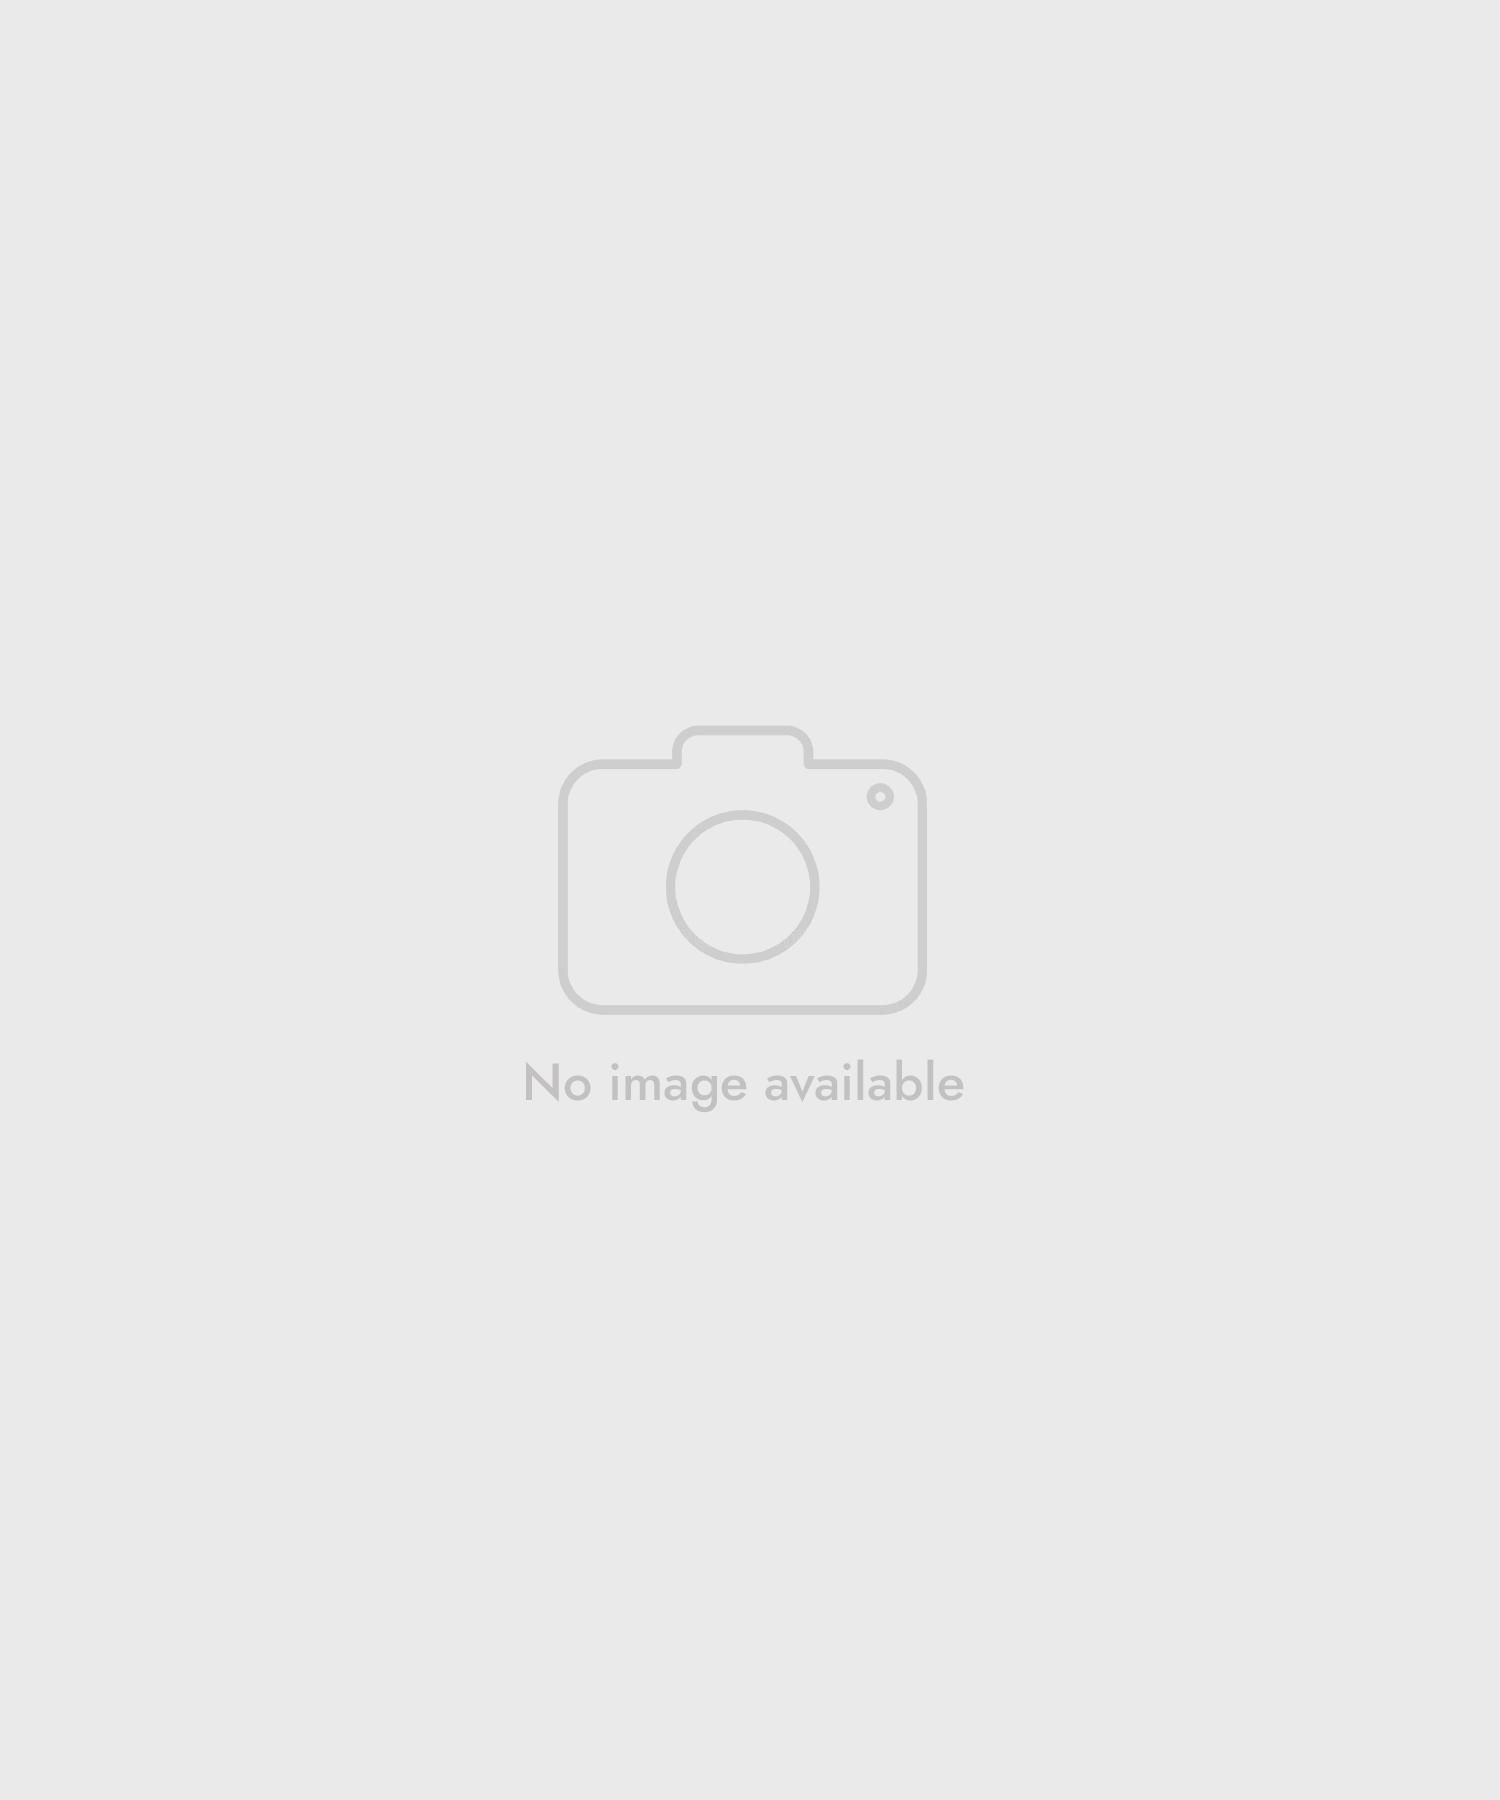 Czarno-brązowa torebka damska